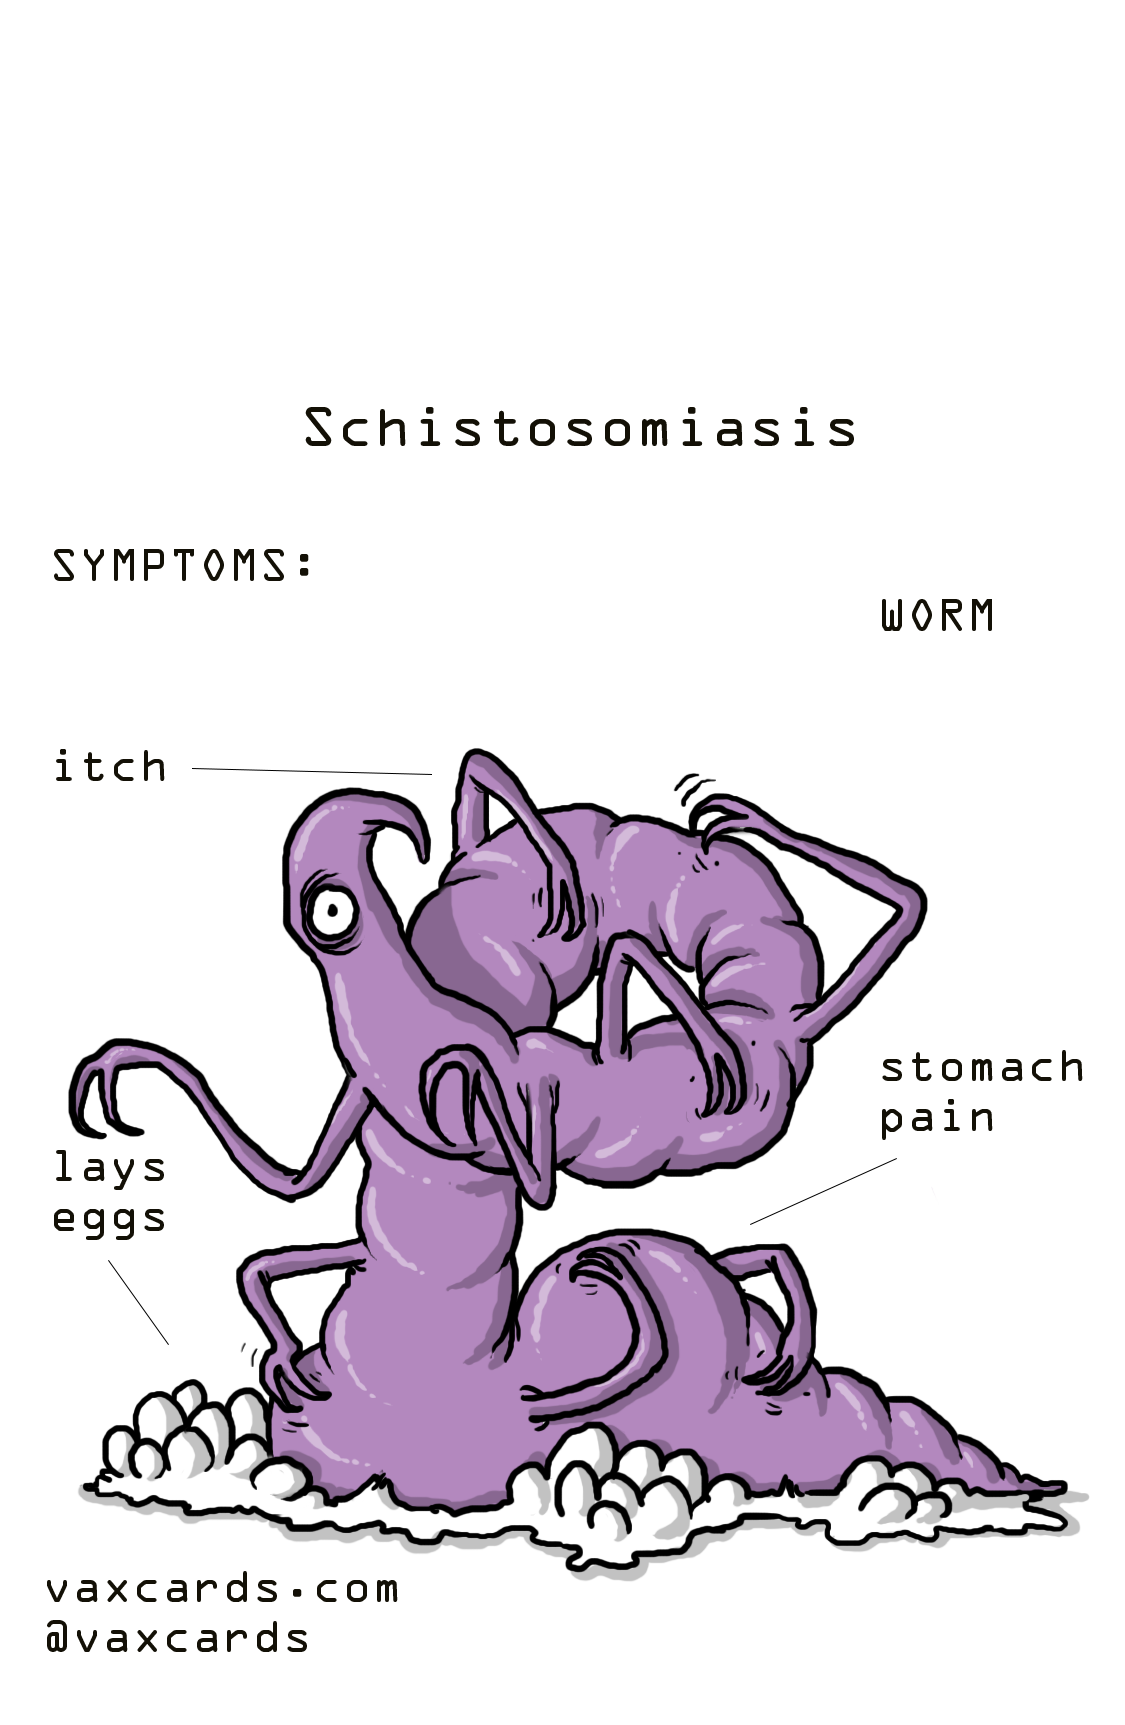 schis bio.png